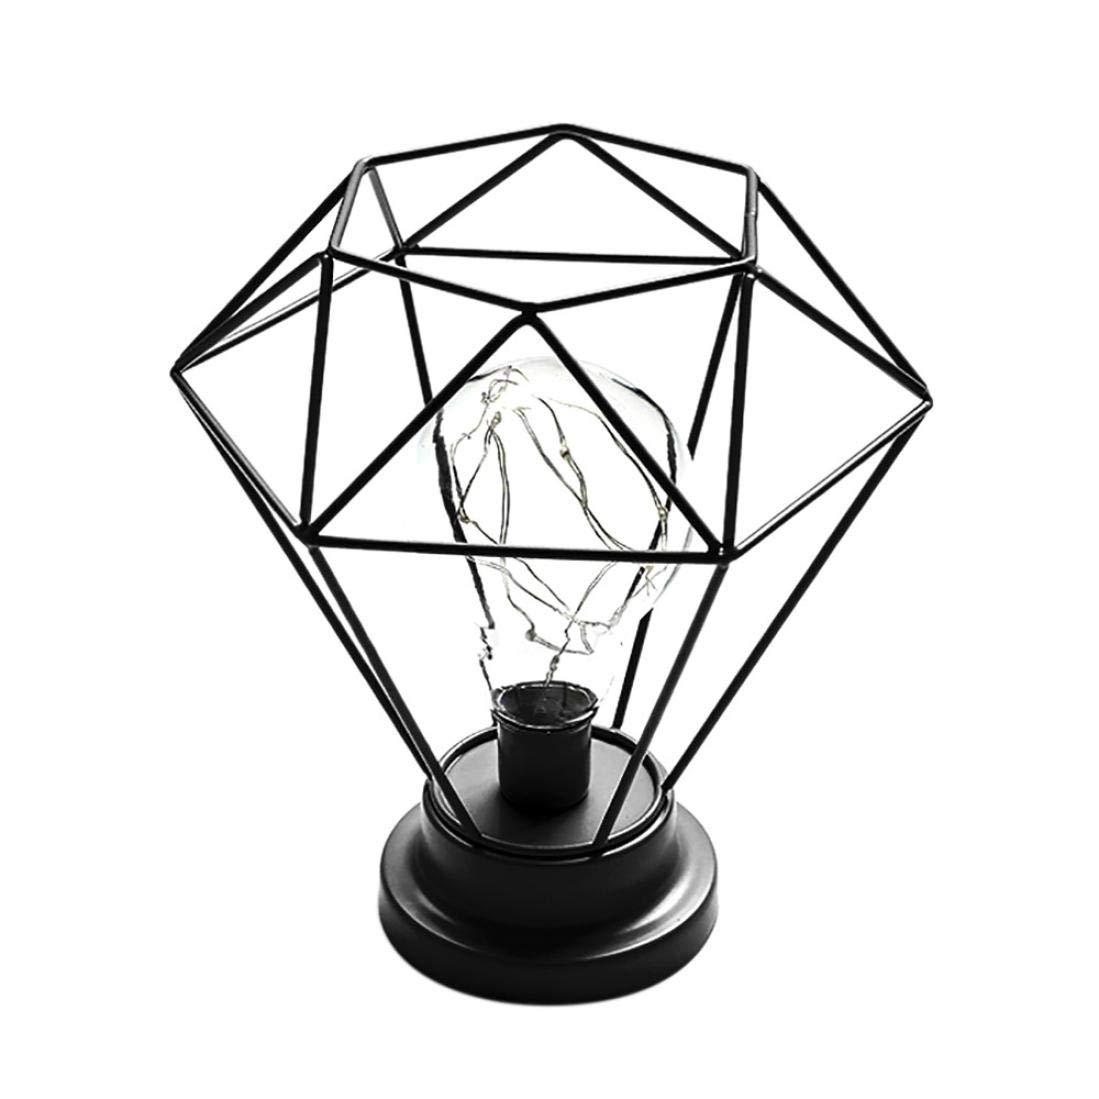 Sonmer Creative Diamond Iron Frame Photography Prop Desk Lamp, for Bedroom Decoration (Black)